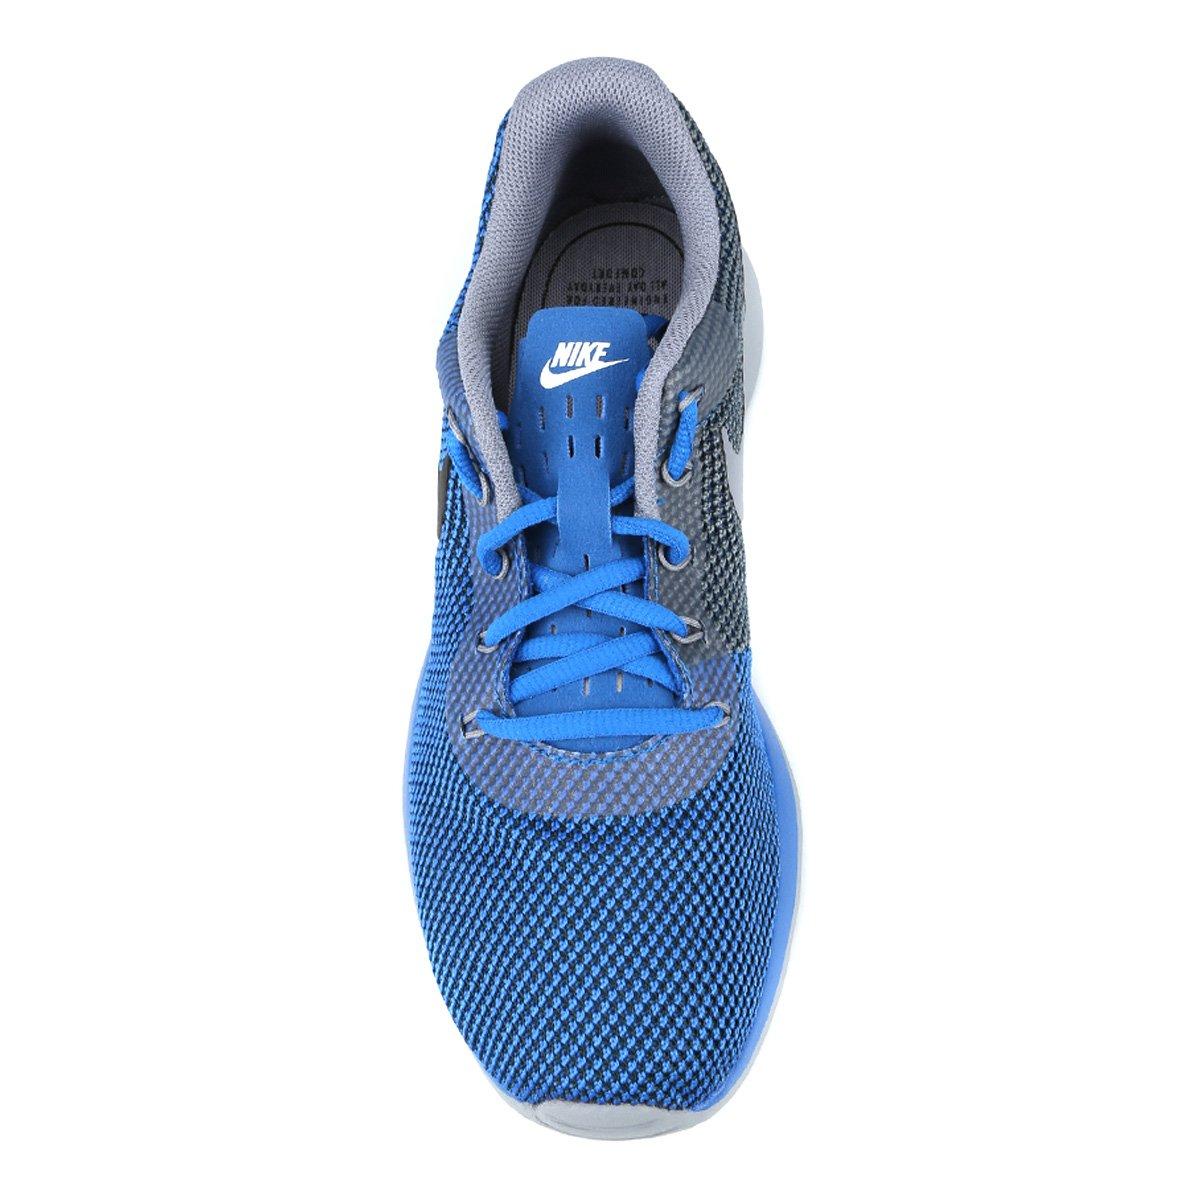 Racer Masculino Cinza Tênis Nike Azul Nike e Racer Tanjun Tênis Tanjun Masculino Png08Pwq